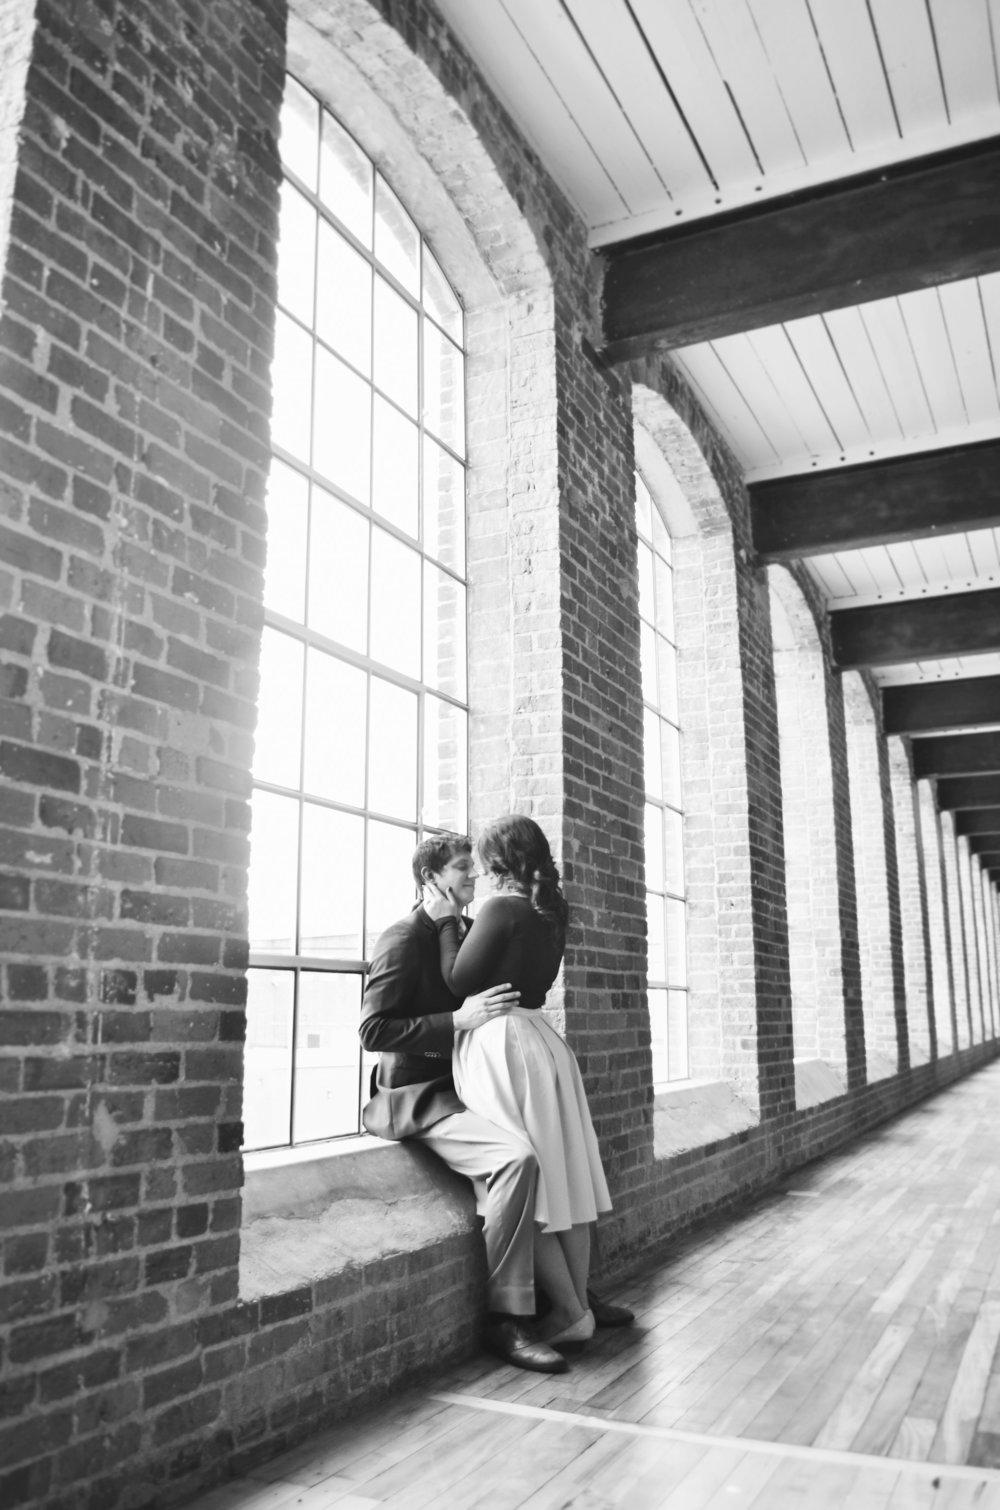 Revolution Mill Events Center Engagement Photography Greensboro North Carolina by Kayli LaFon Photography